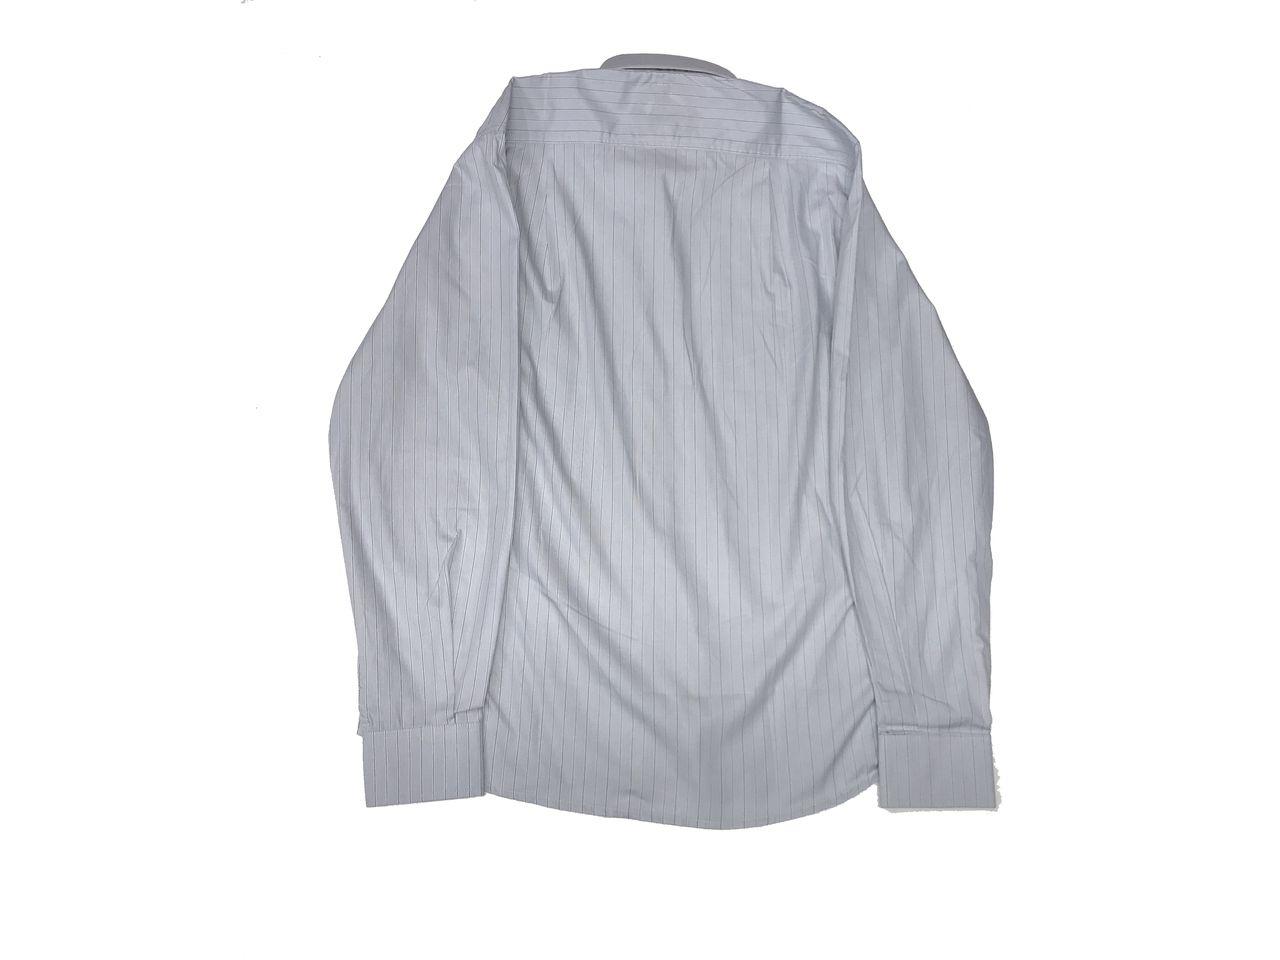 Camisa Social Masculina Listrada Azul  - Boutique Mangalarga